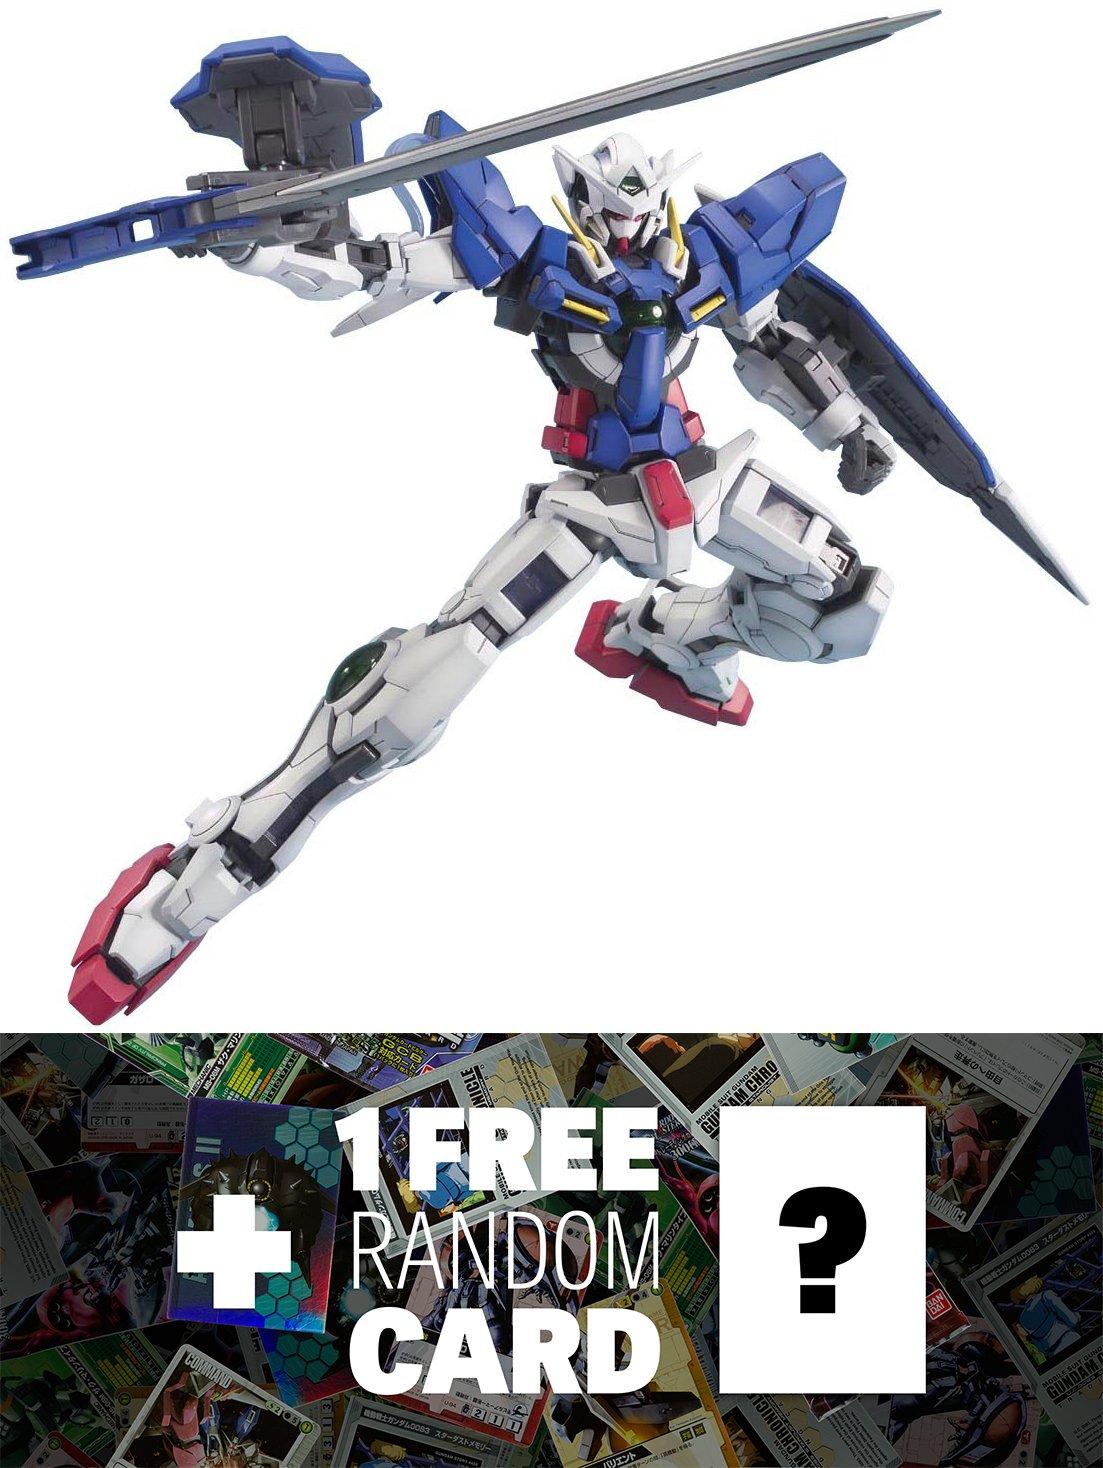 gn-001 Gundam Exia : MG GundamマスターGrade 1 / 100モデルキット+ 1 Free official Gundam Japanese tradingカードバンドル B00RUSR32I